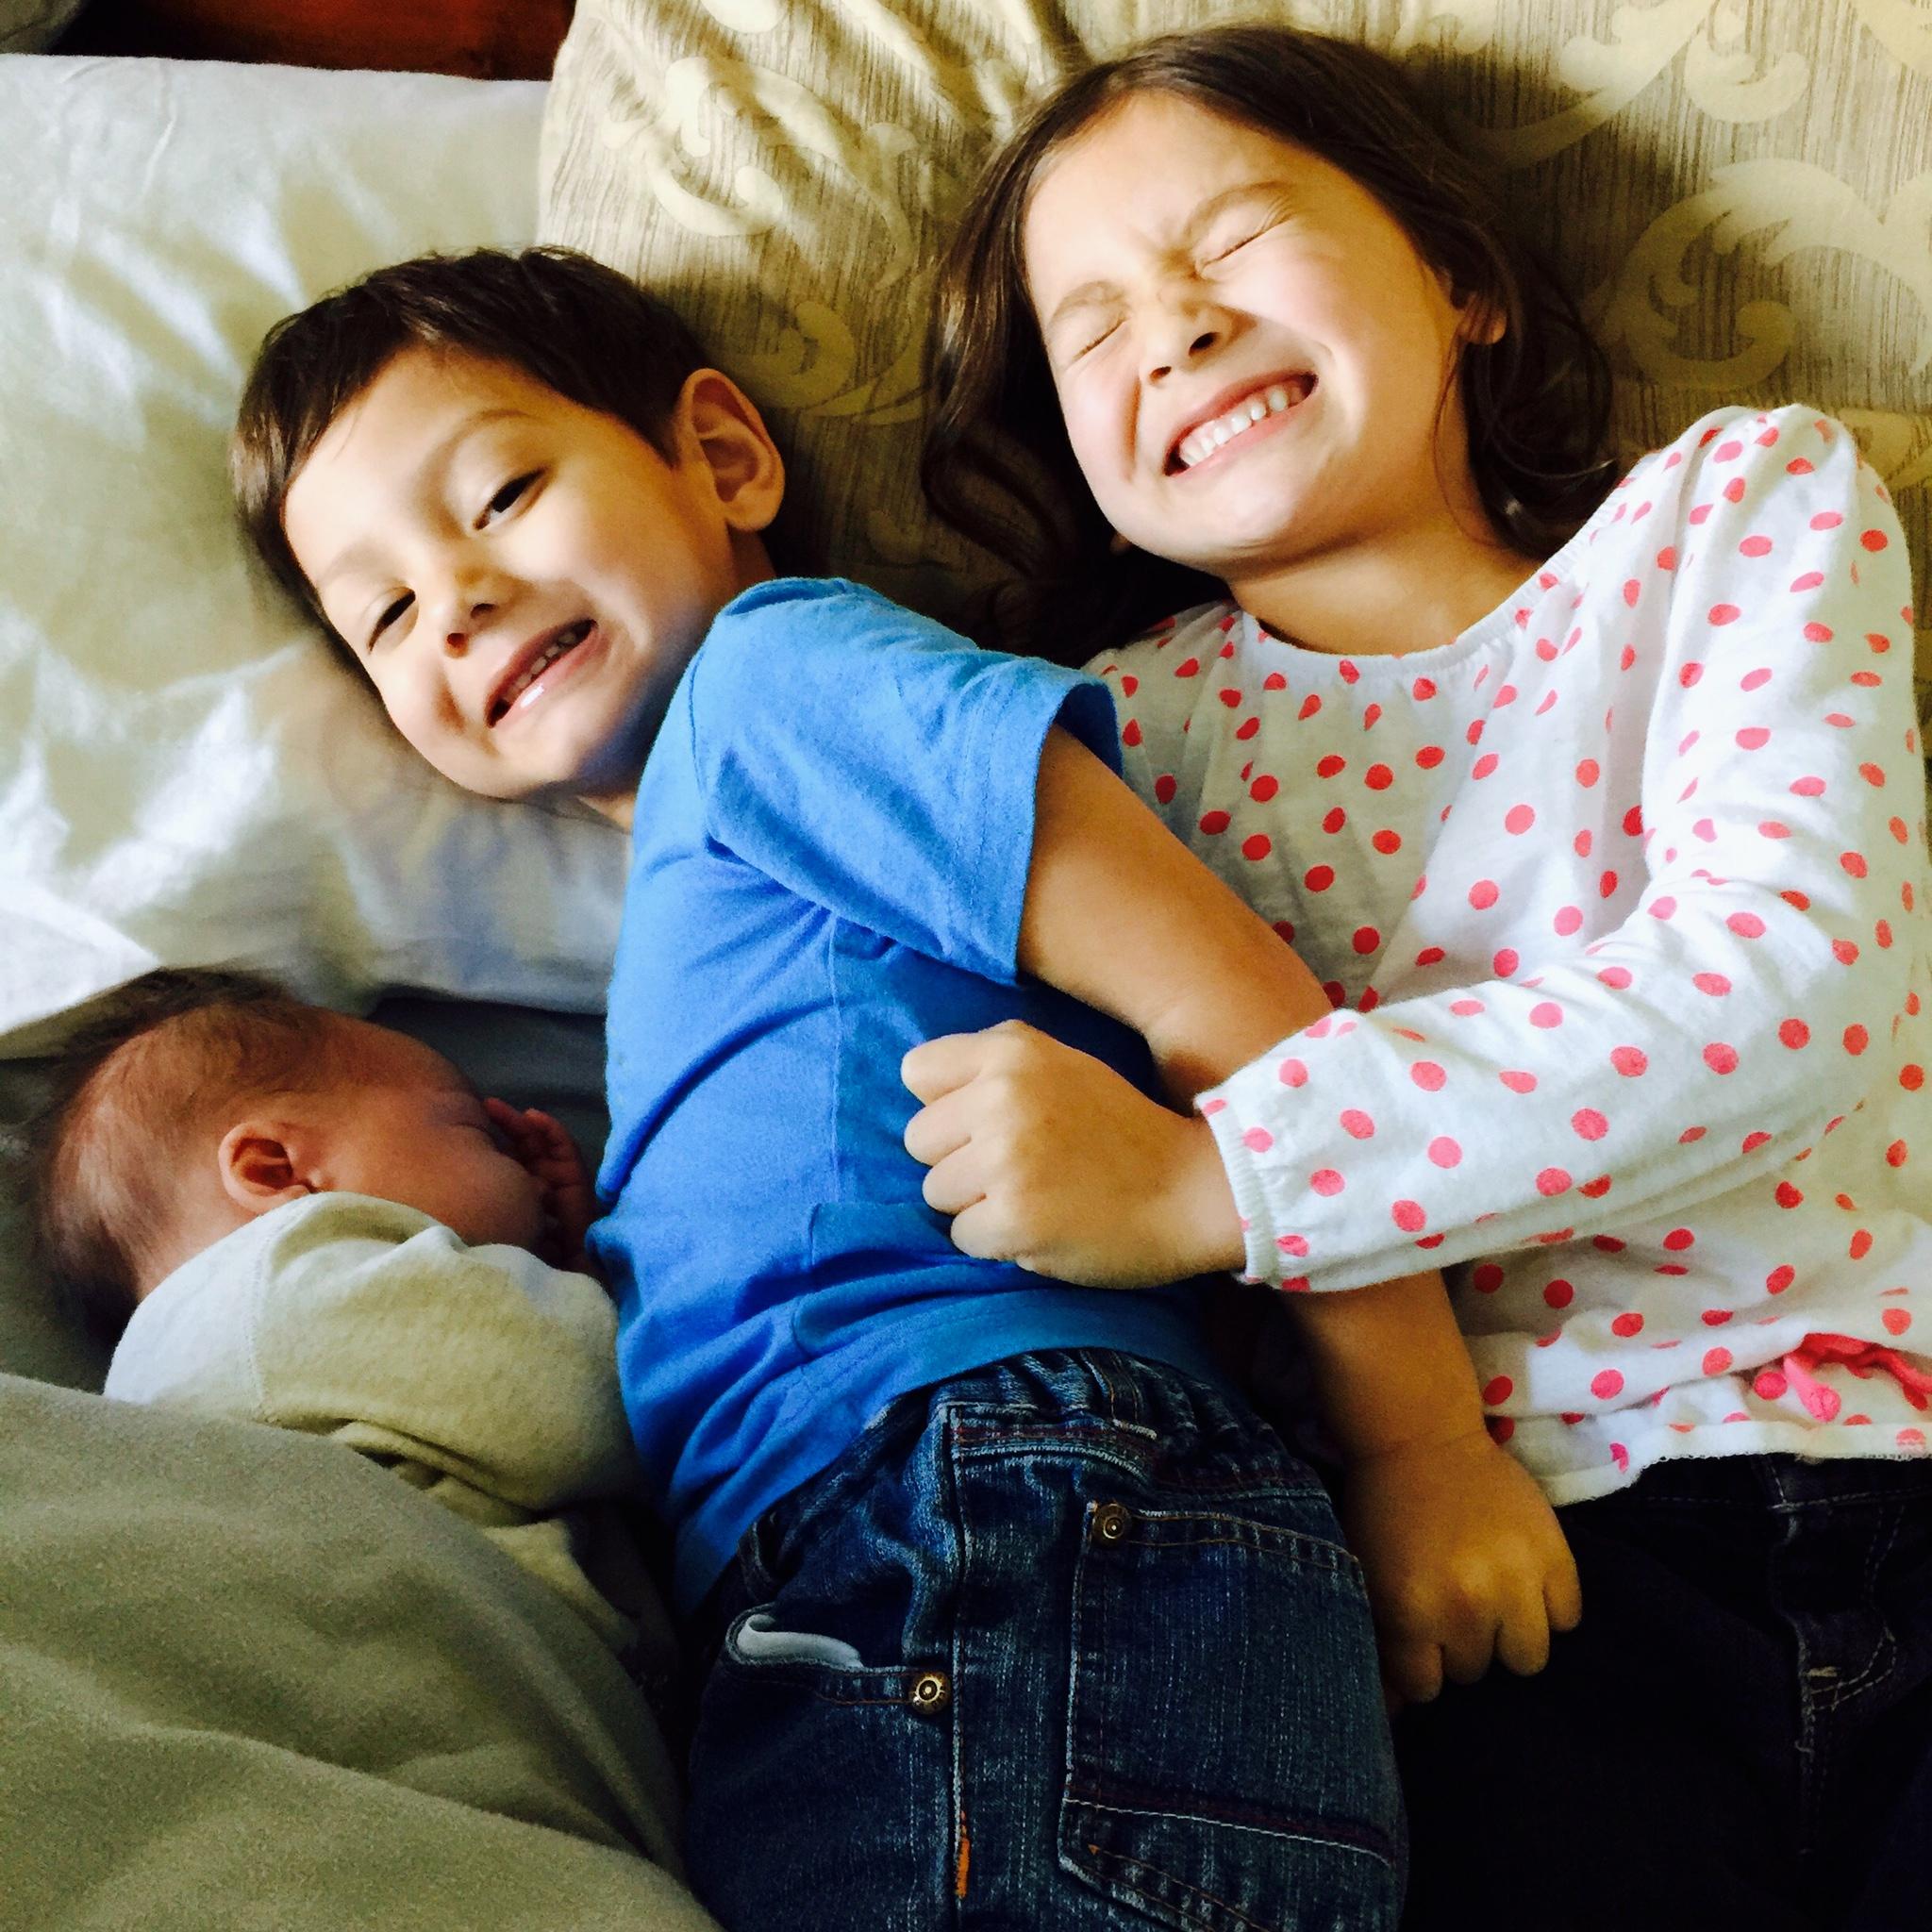 Our three kiddos